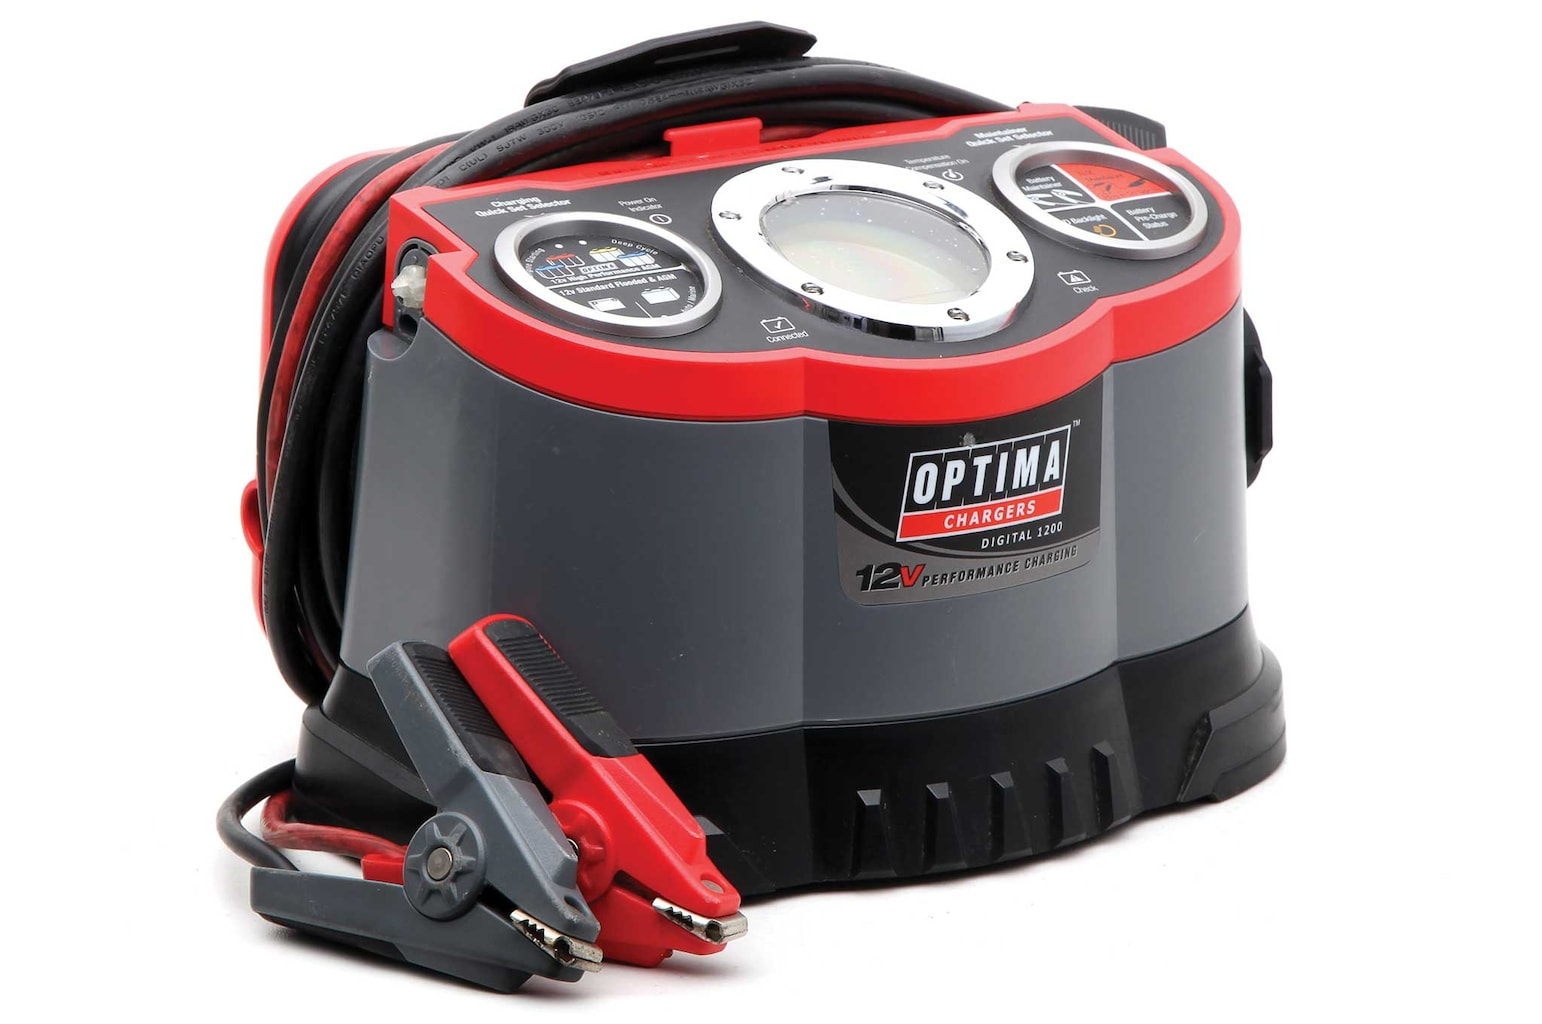 battery reviews optima digital 1200 charger 006